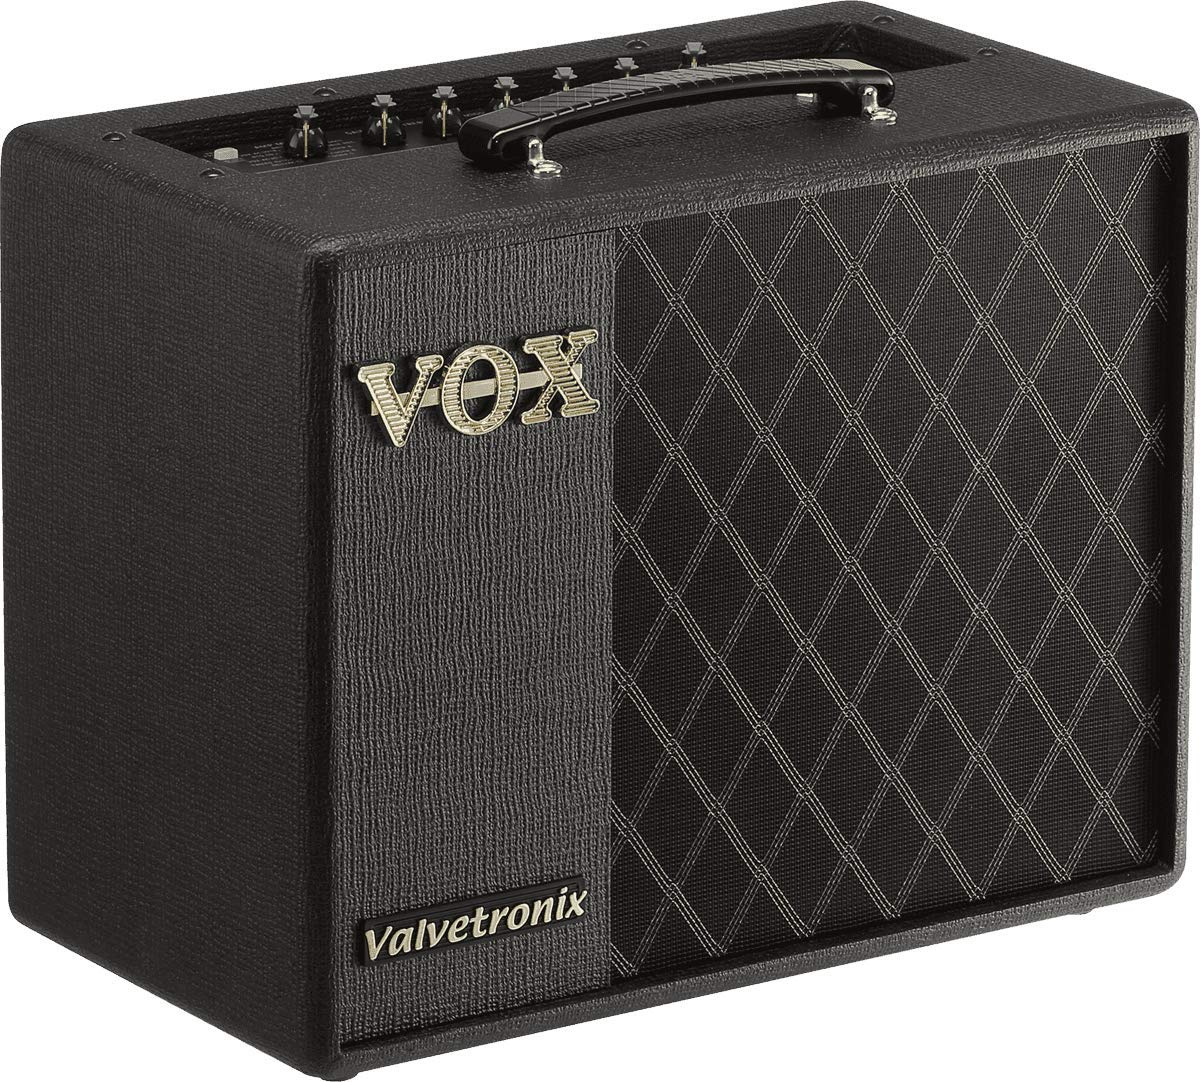 VOX Valvetronix VT20X Modeling Amplifier by Vox